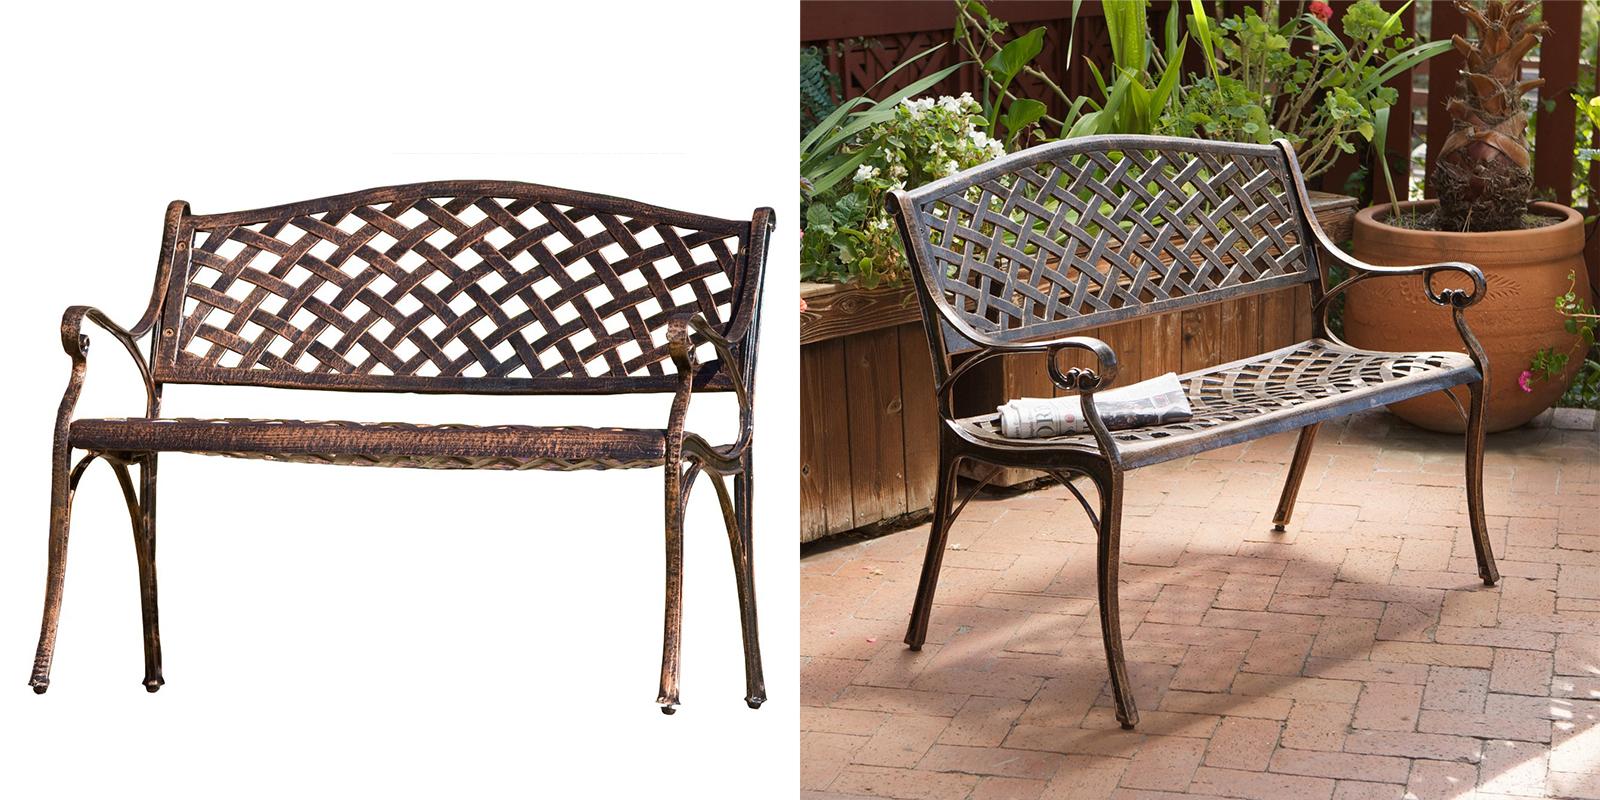 Patio Chair - Copper Finish Cast Aluminum Bench